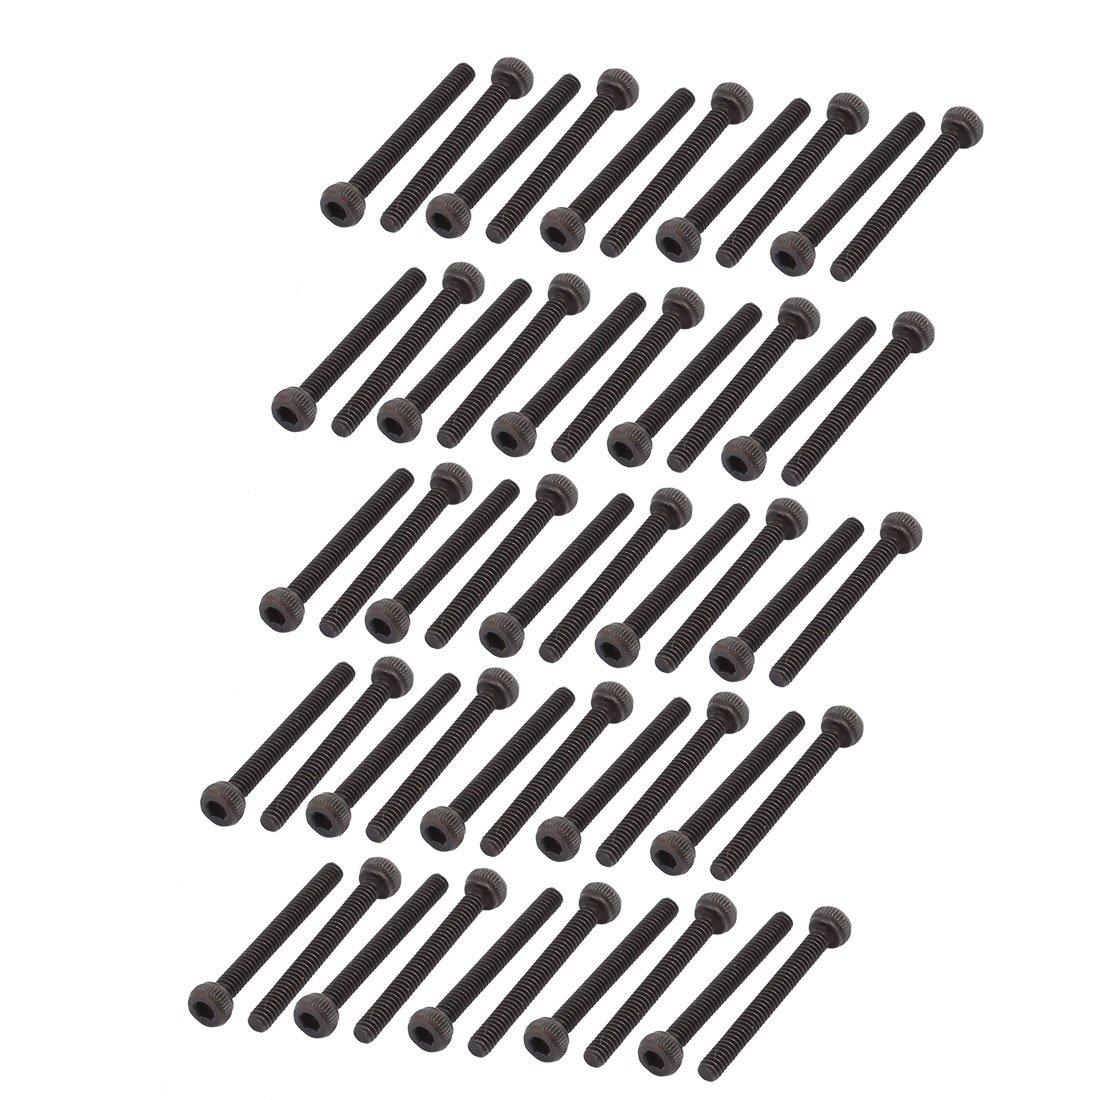 uxcell 50Pcs Black M1.8 x 18mm Alloy Steel Hex Bolt Socket Head Cap Machine Screws